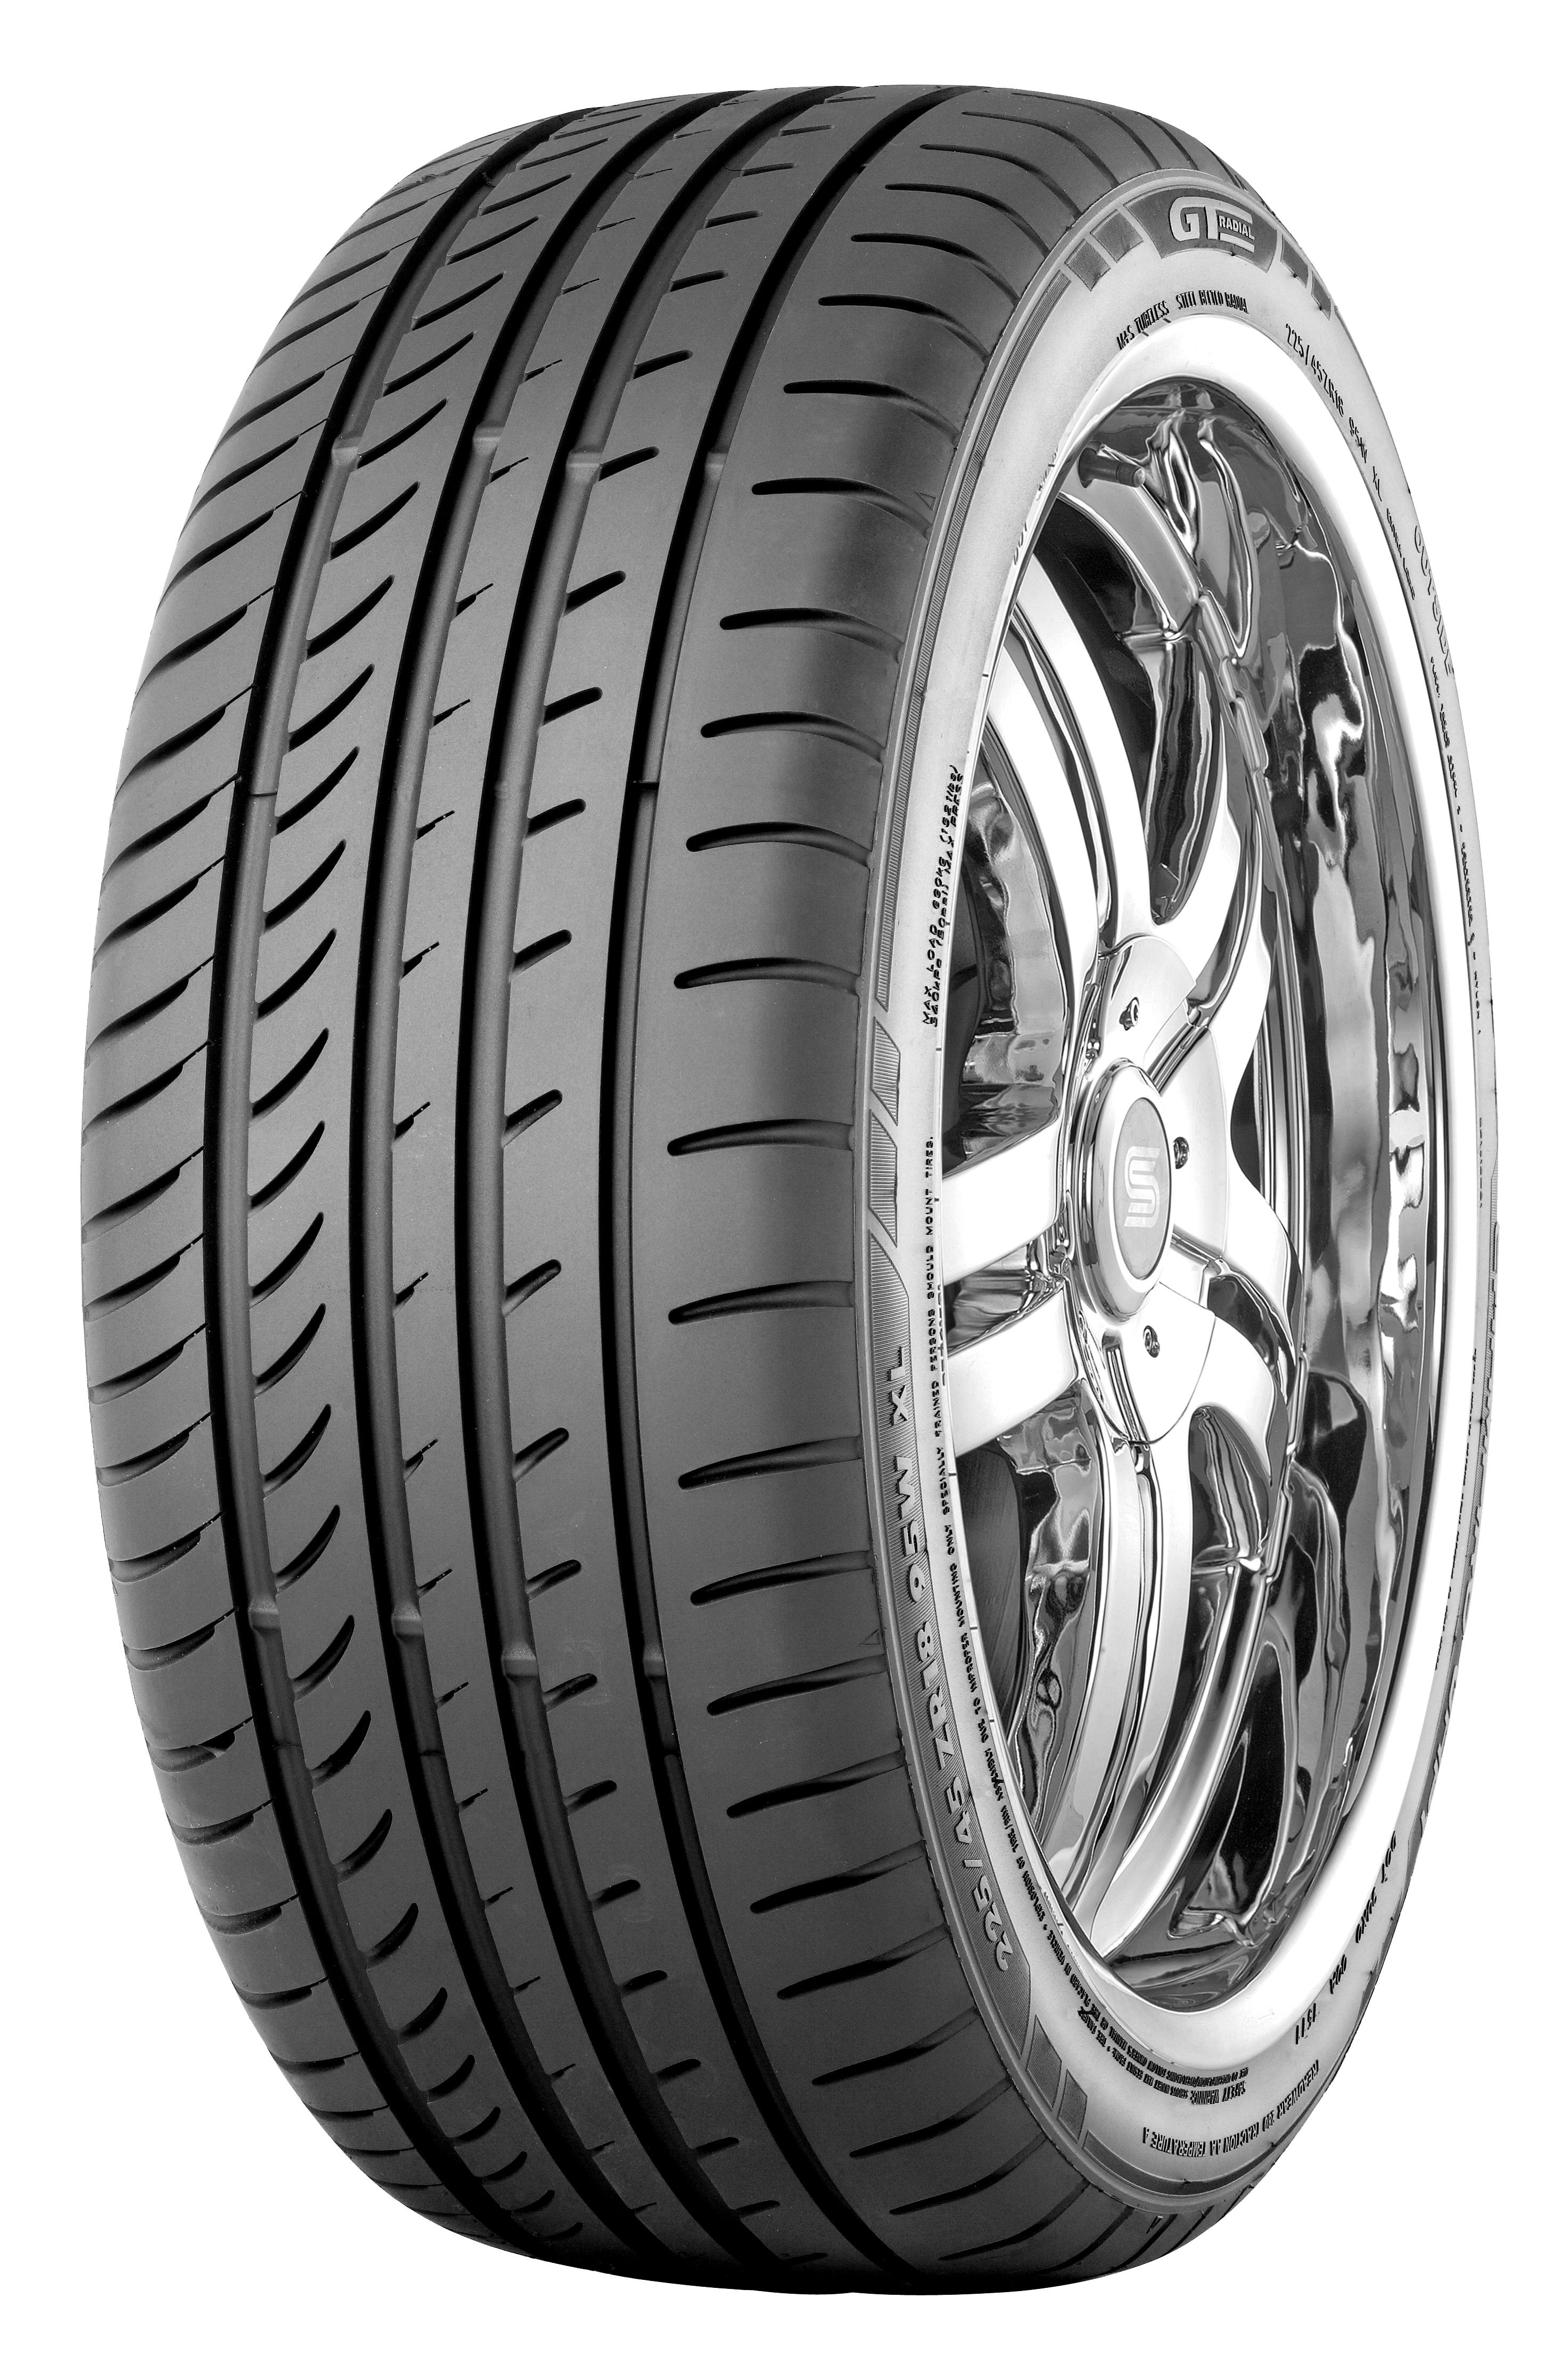 GT Radial 215/40R16 86W Champiro UHP1 XL DOT15